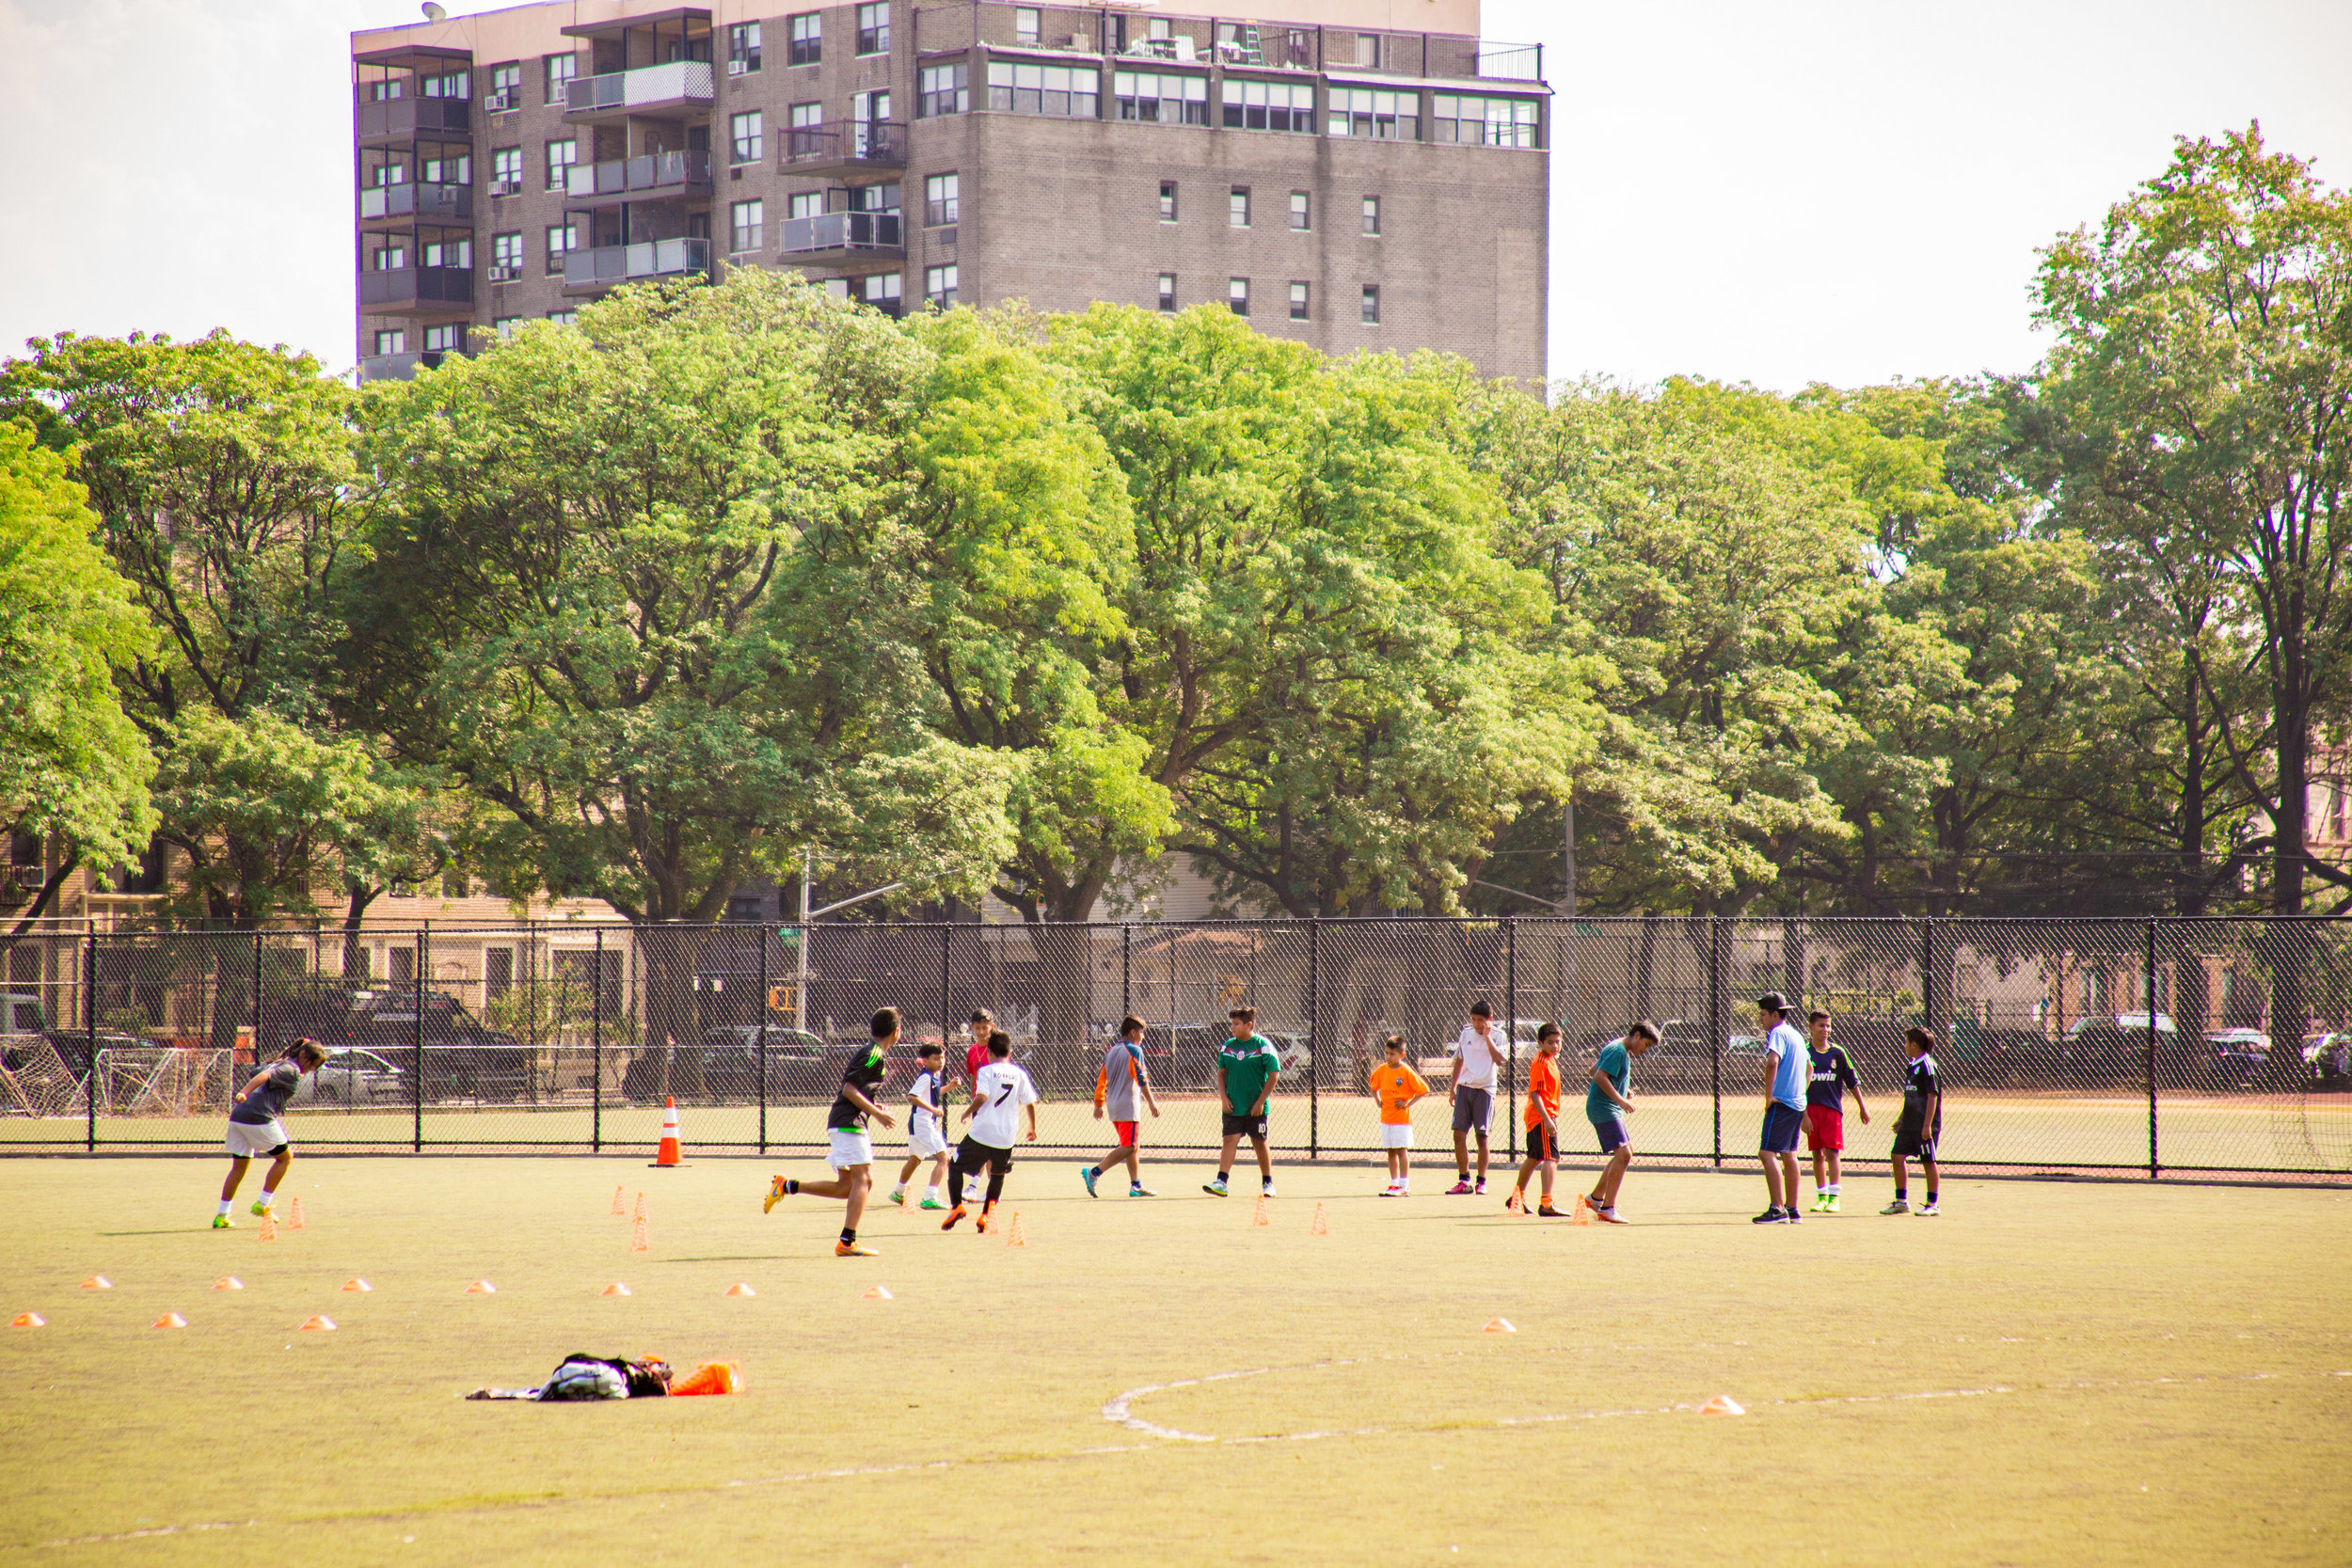 LSNY_Parade_Grounds-21.jpg